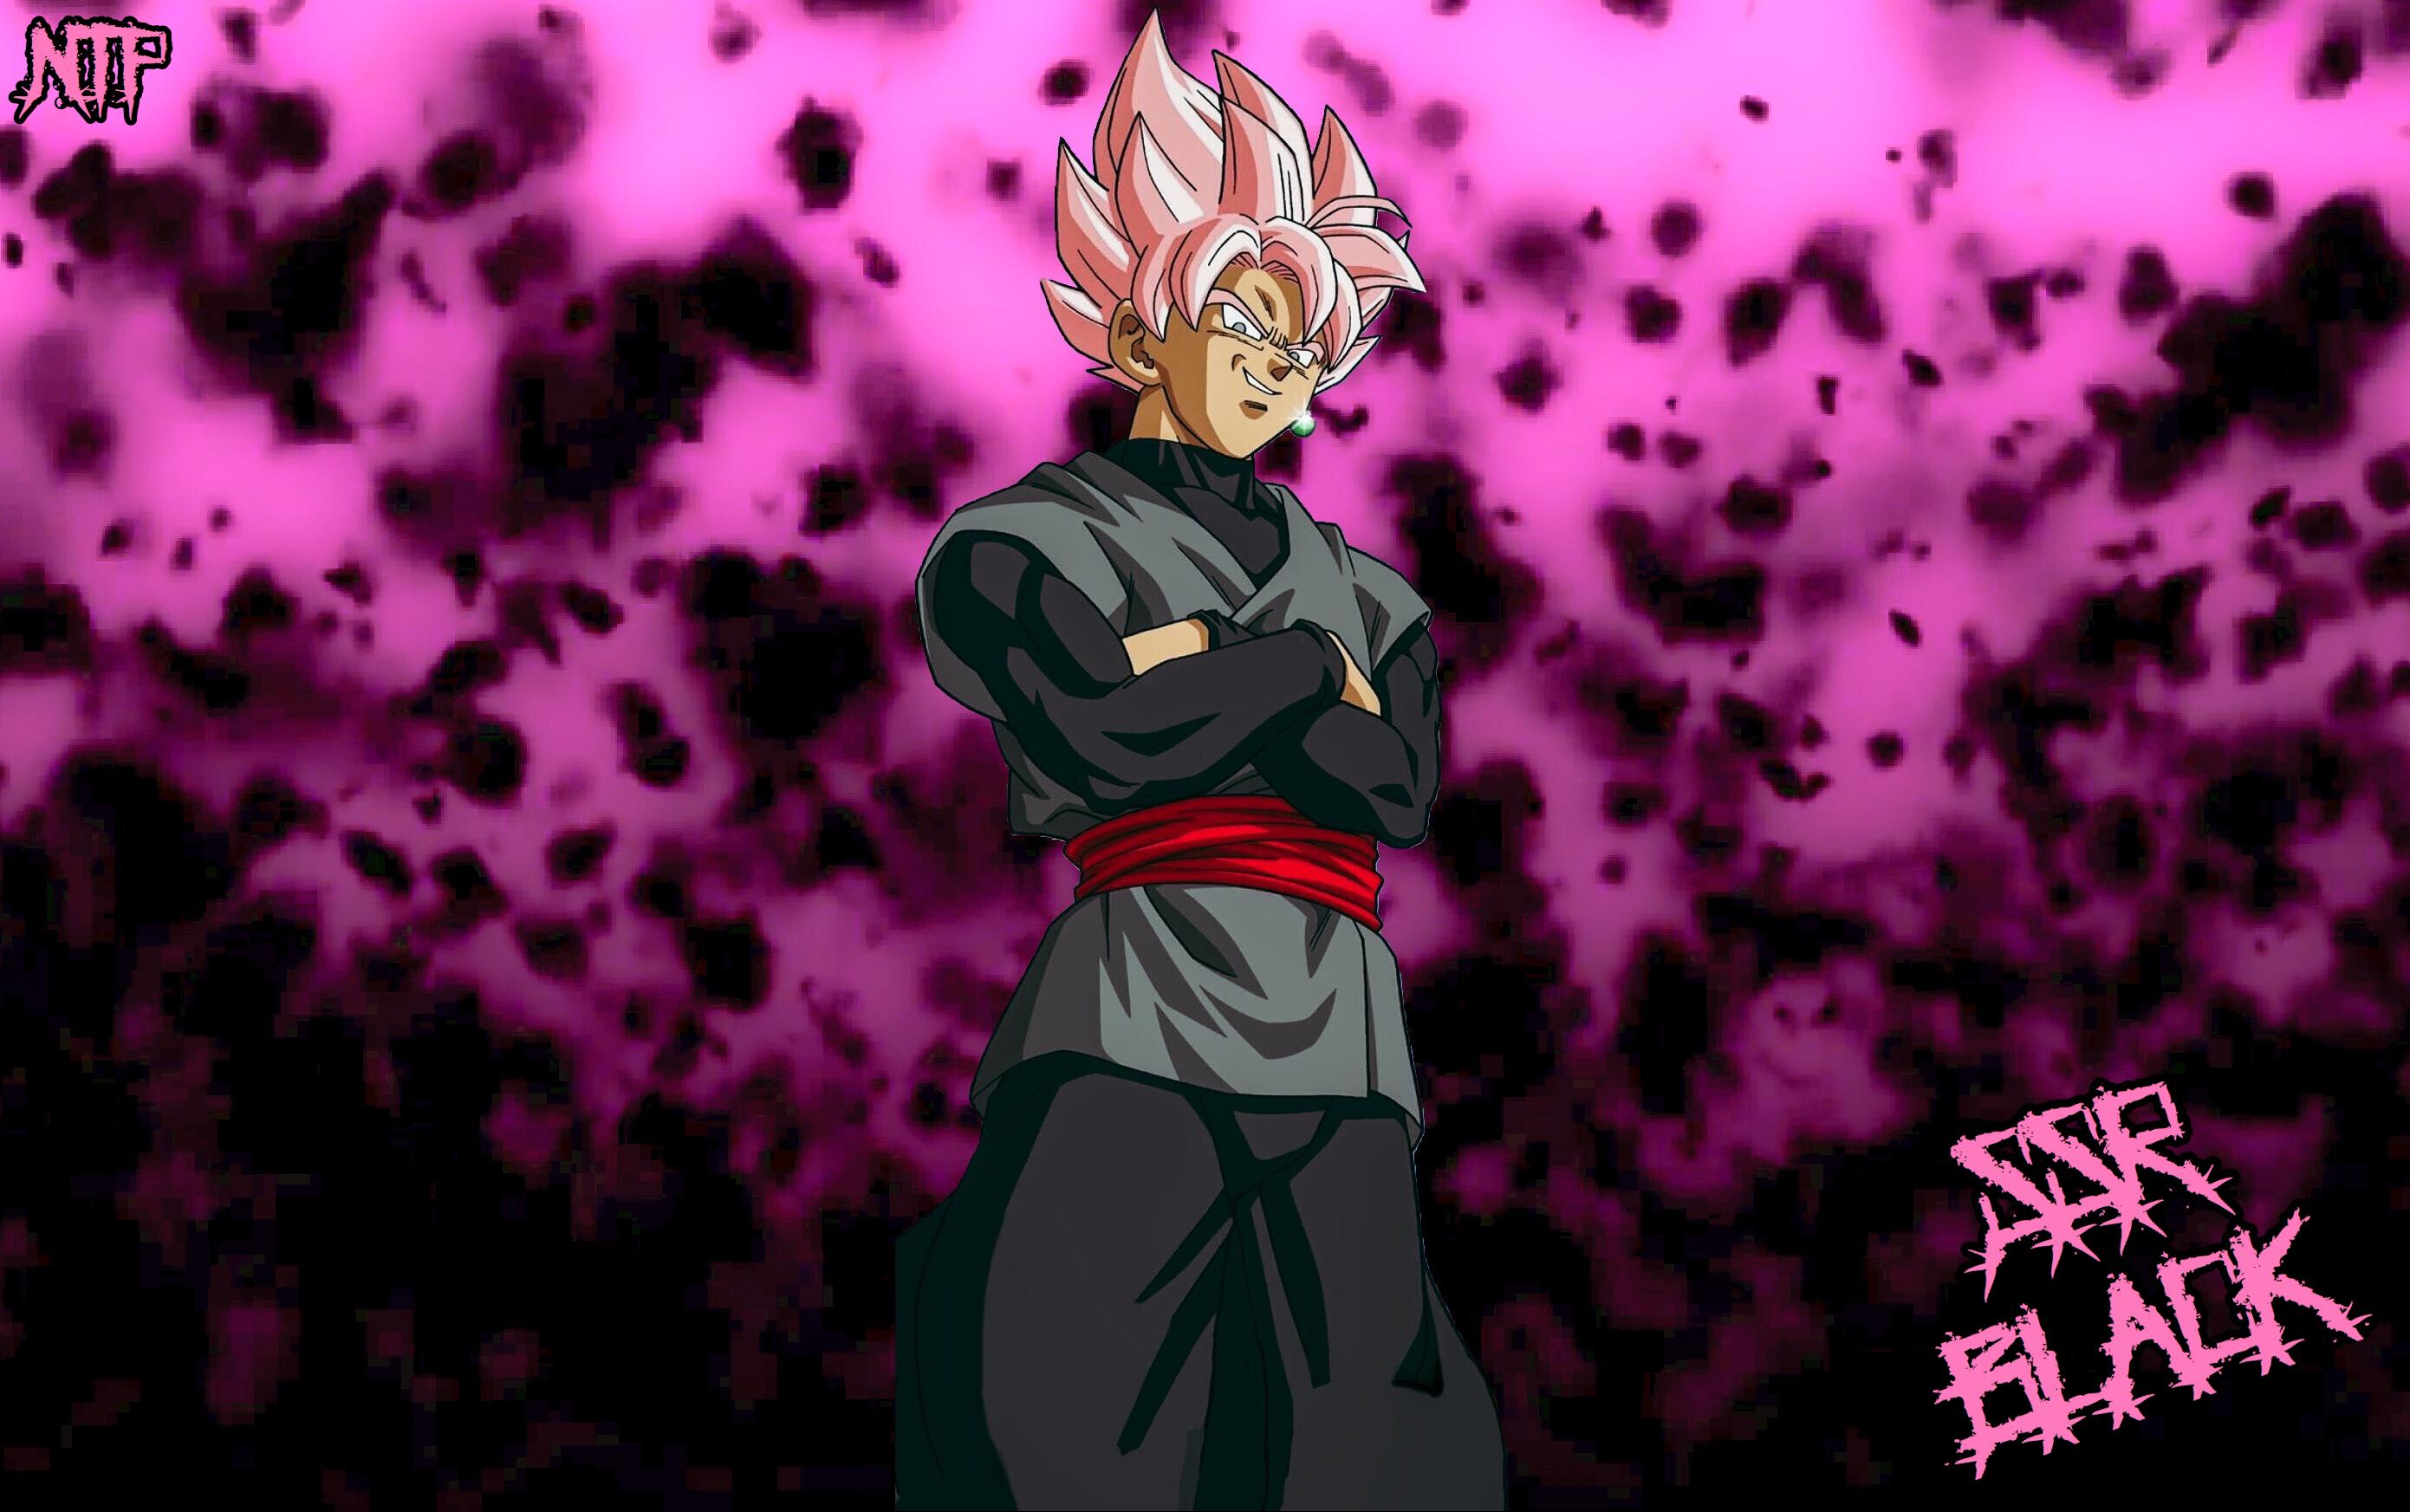 Super Saiyan Rose Black Goku Wallpaper By Nickirixxt On Deviantart